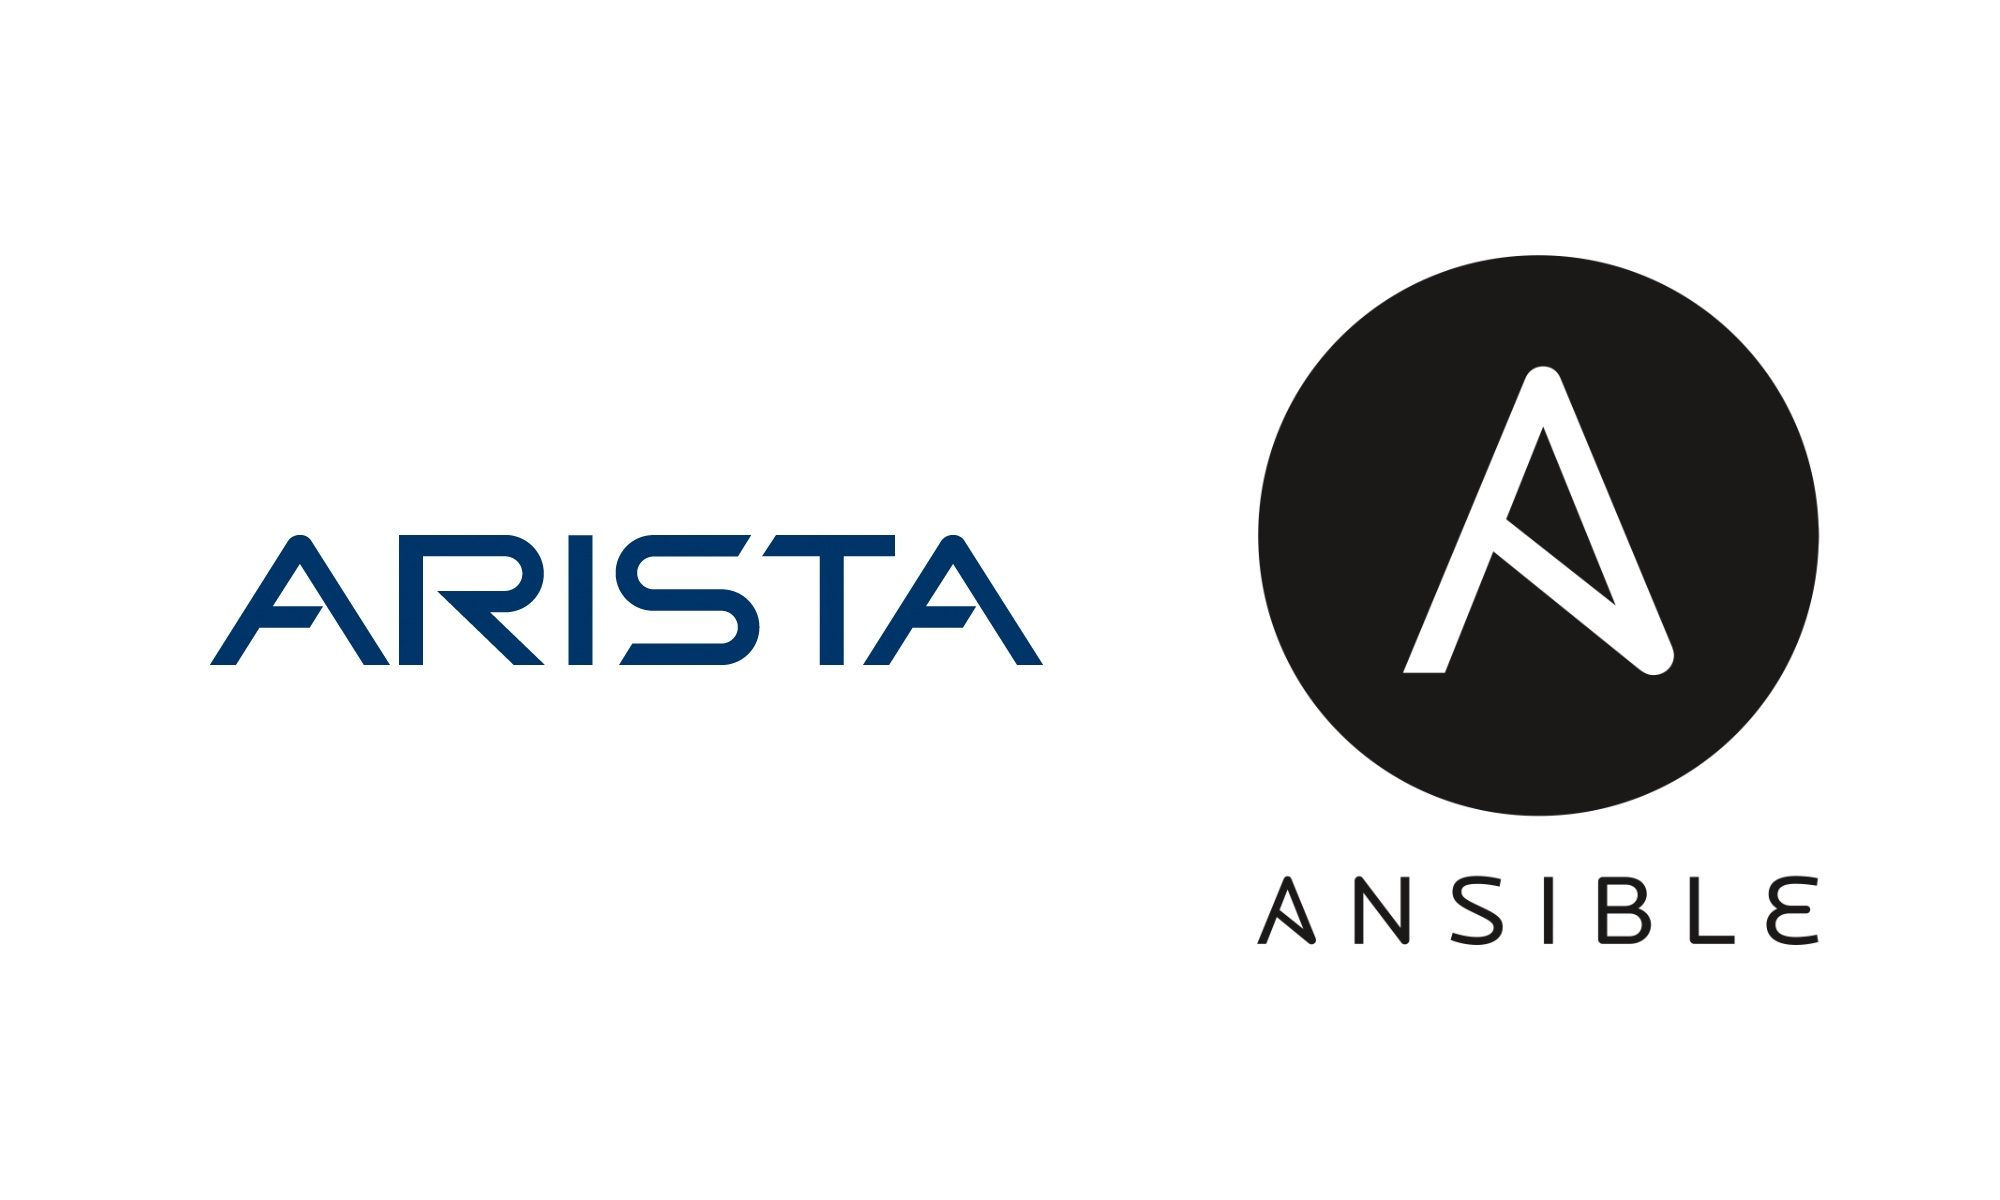 Arista Ansible